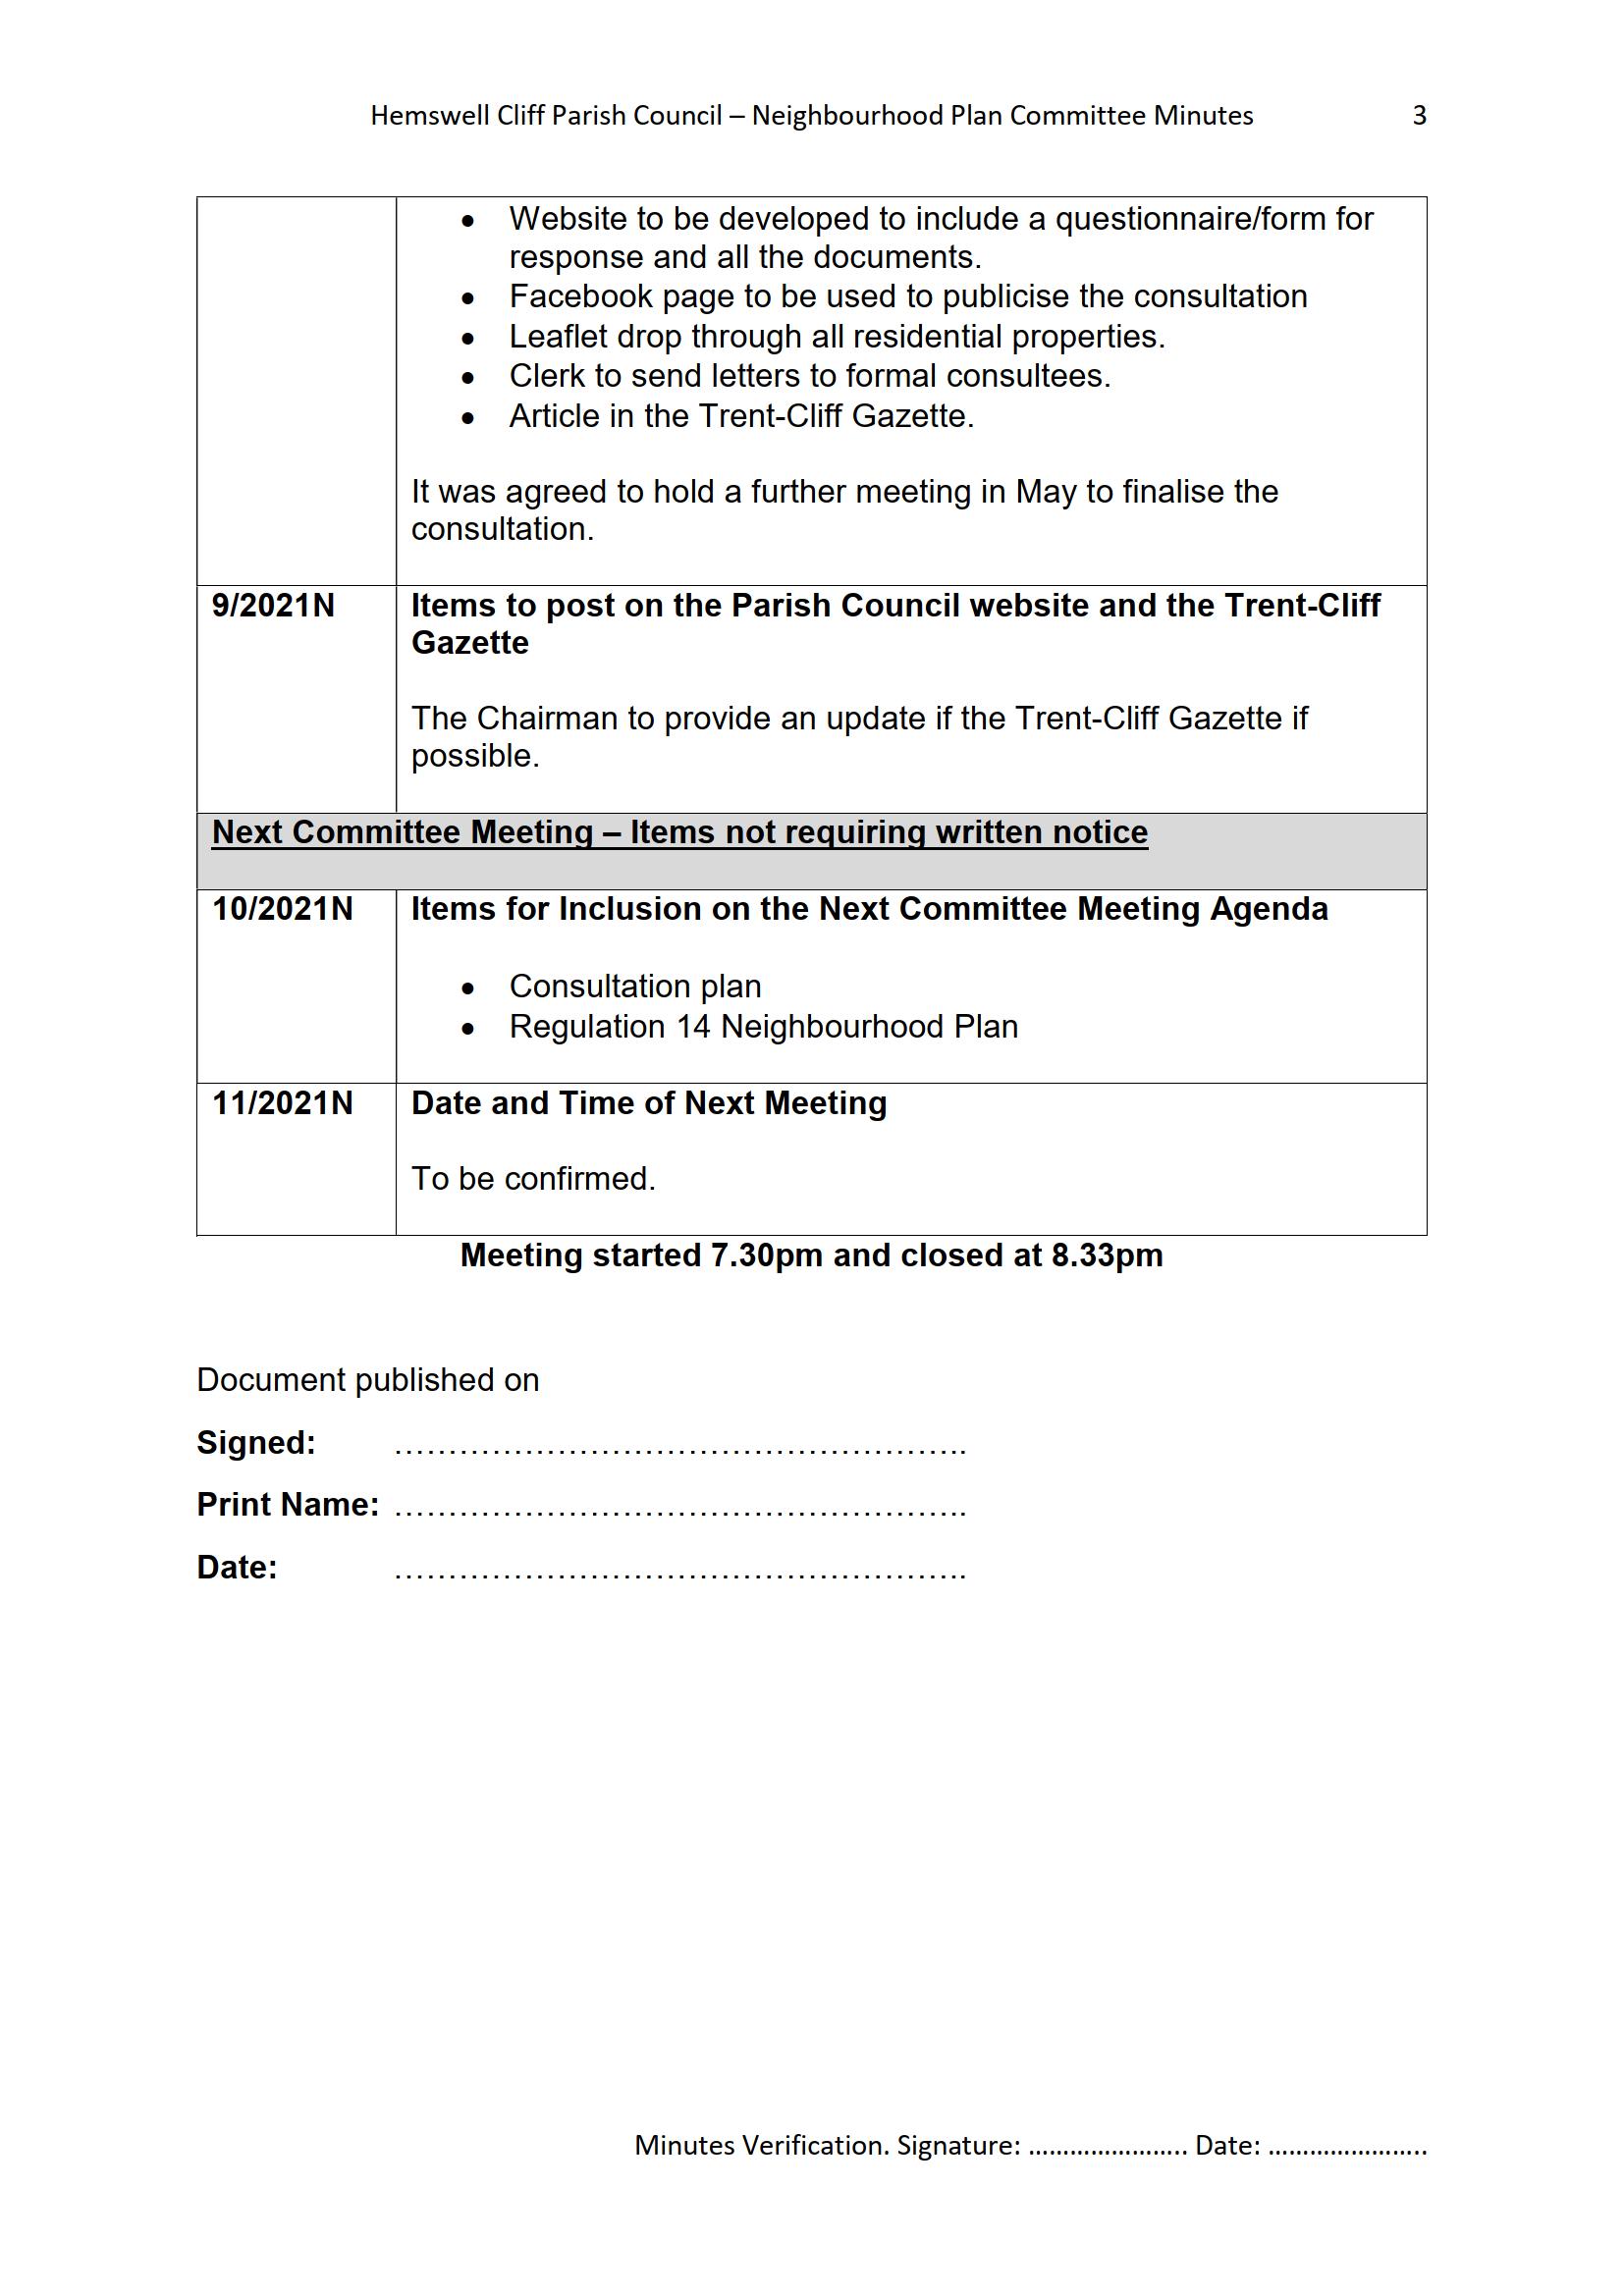 HCPC_NPC_Minutes_12.04.21_3.png